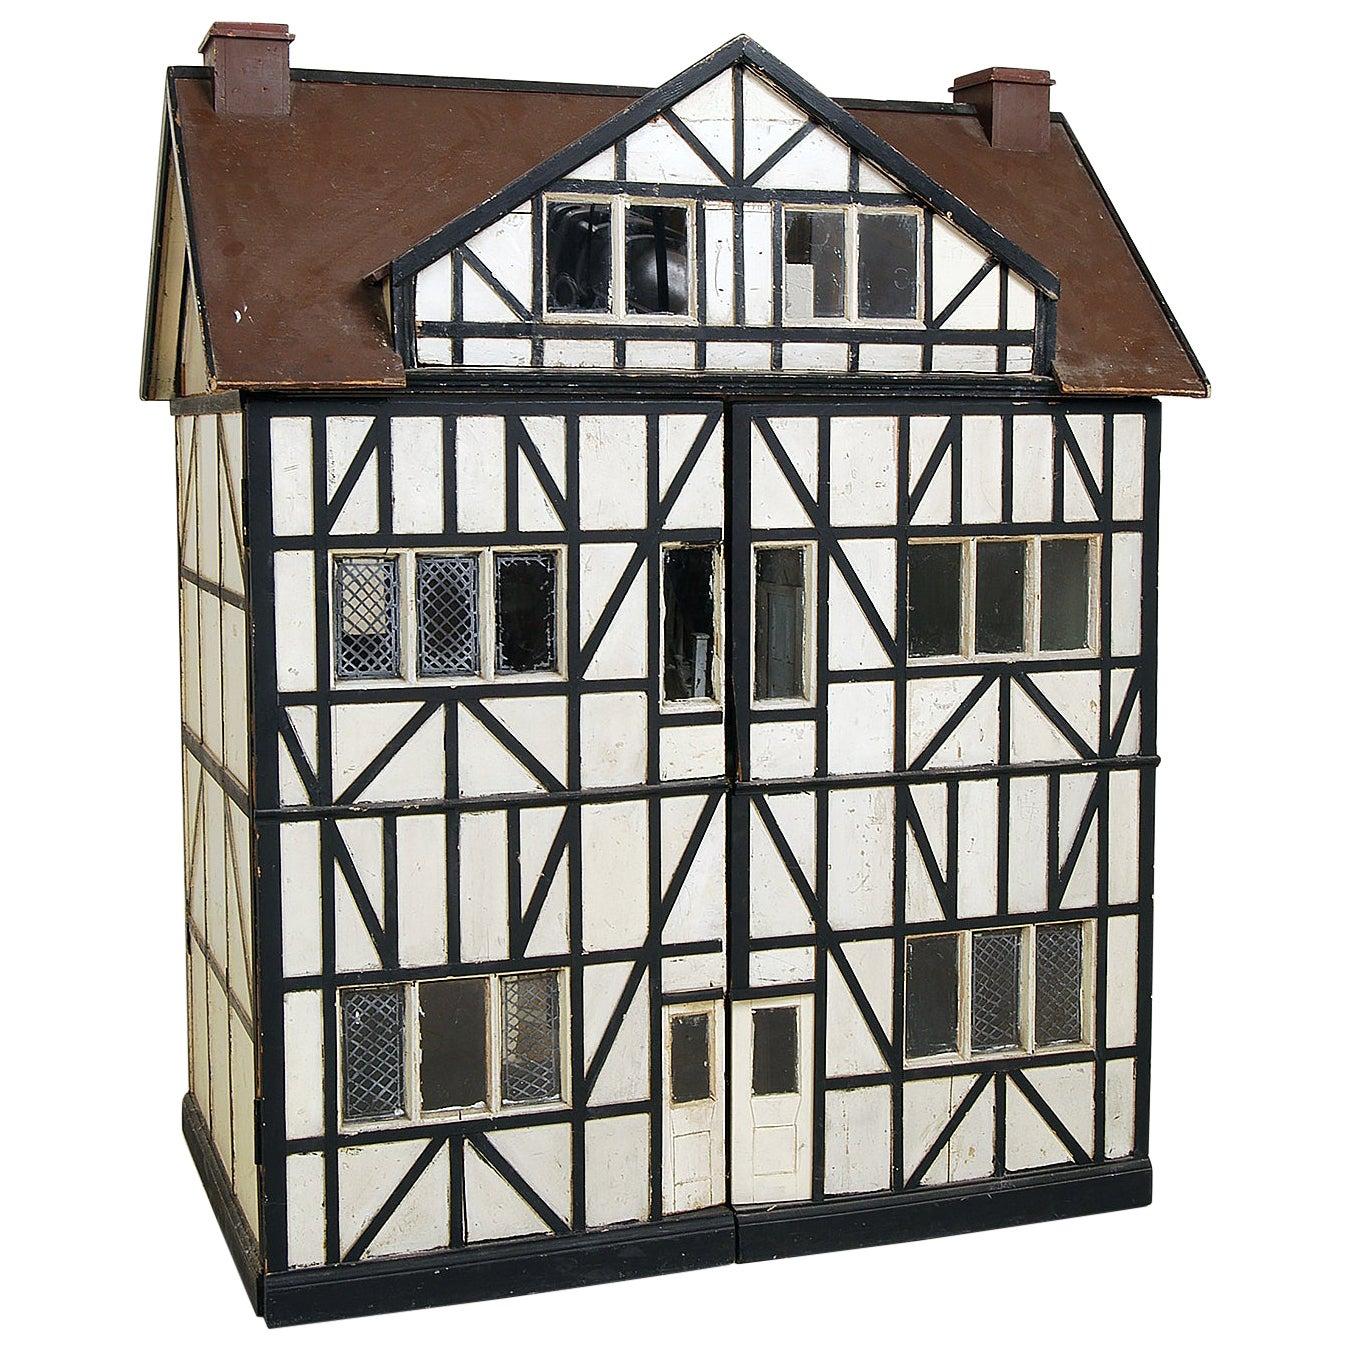 Large Antique Scratch-Built Model English Tudor Mansion Wooden Doll's House